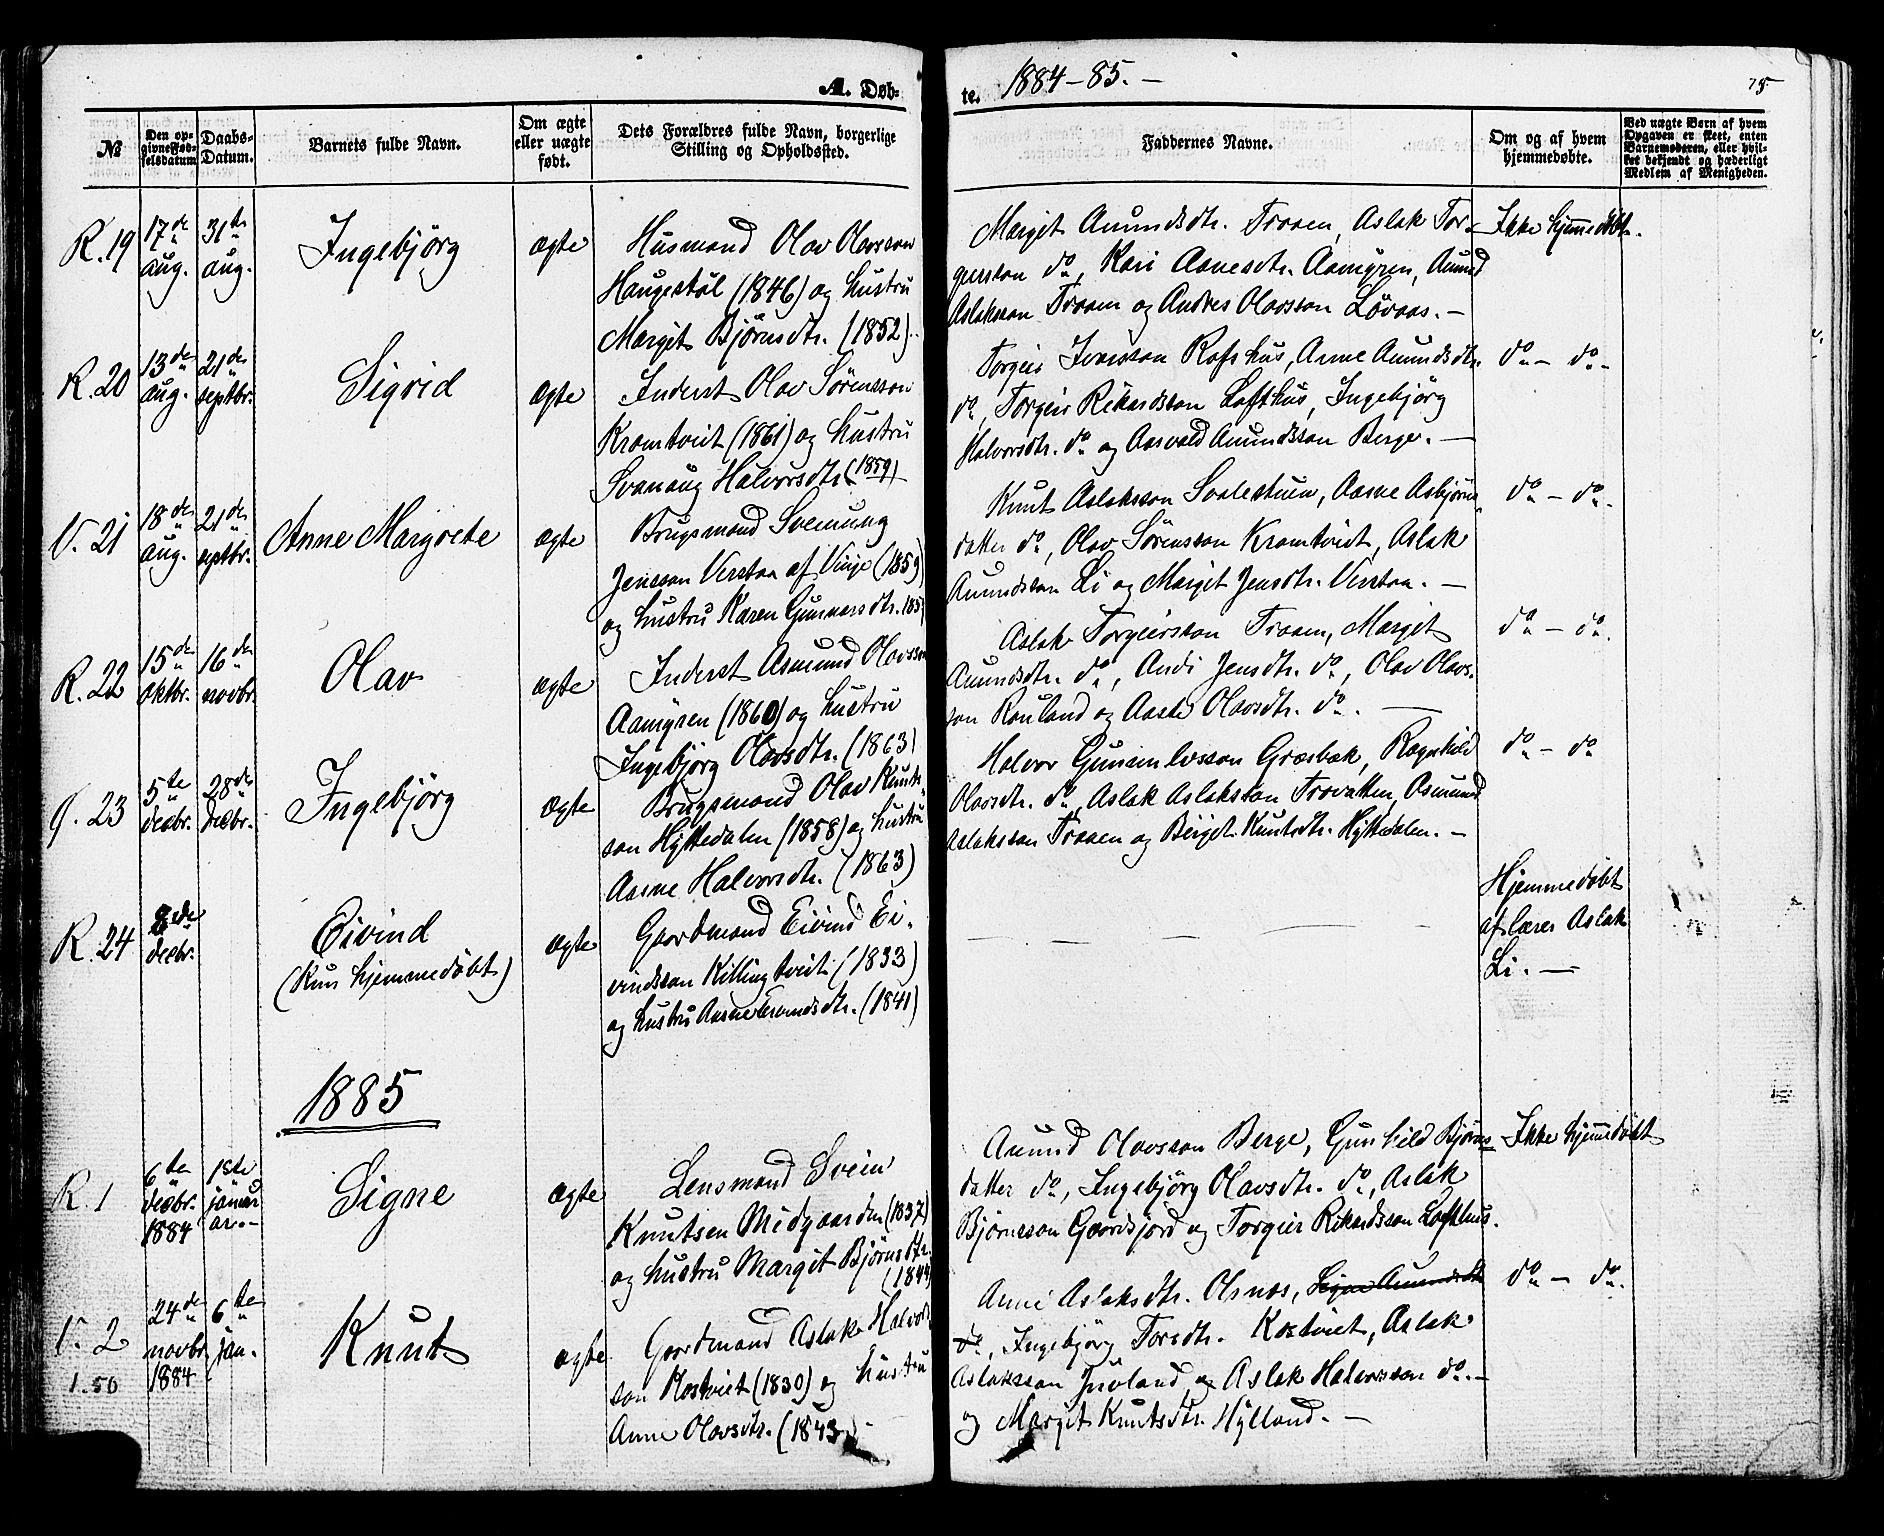 SAKO, Rauland kirkebøker, F/Fa/L0003: Ministerialbok nr. 3, 1859-1886, s. 75